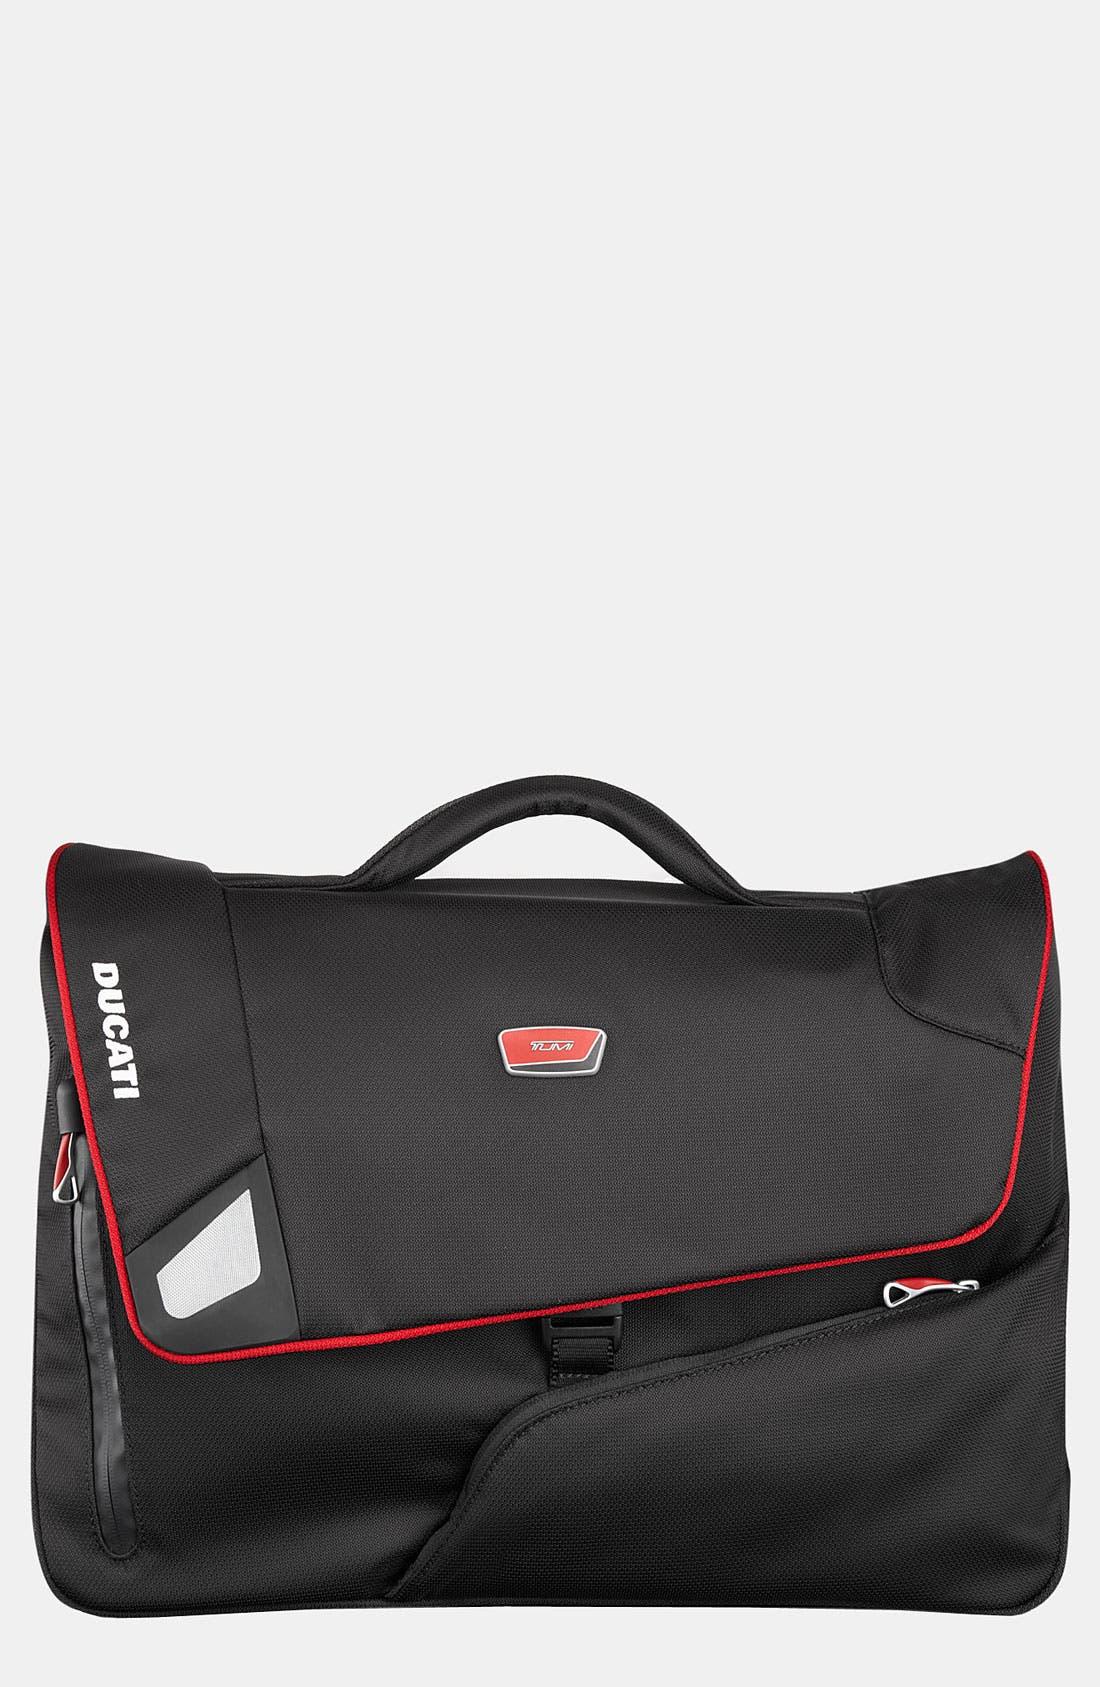 Alternate Image 1 Selected - Tumi 'Ducati - Accelerator' Slim Laptop Briefcase